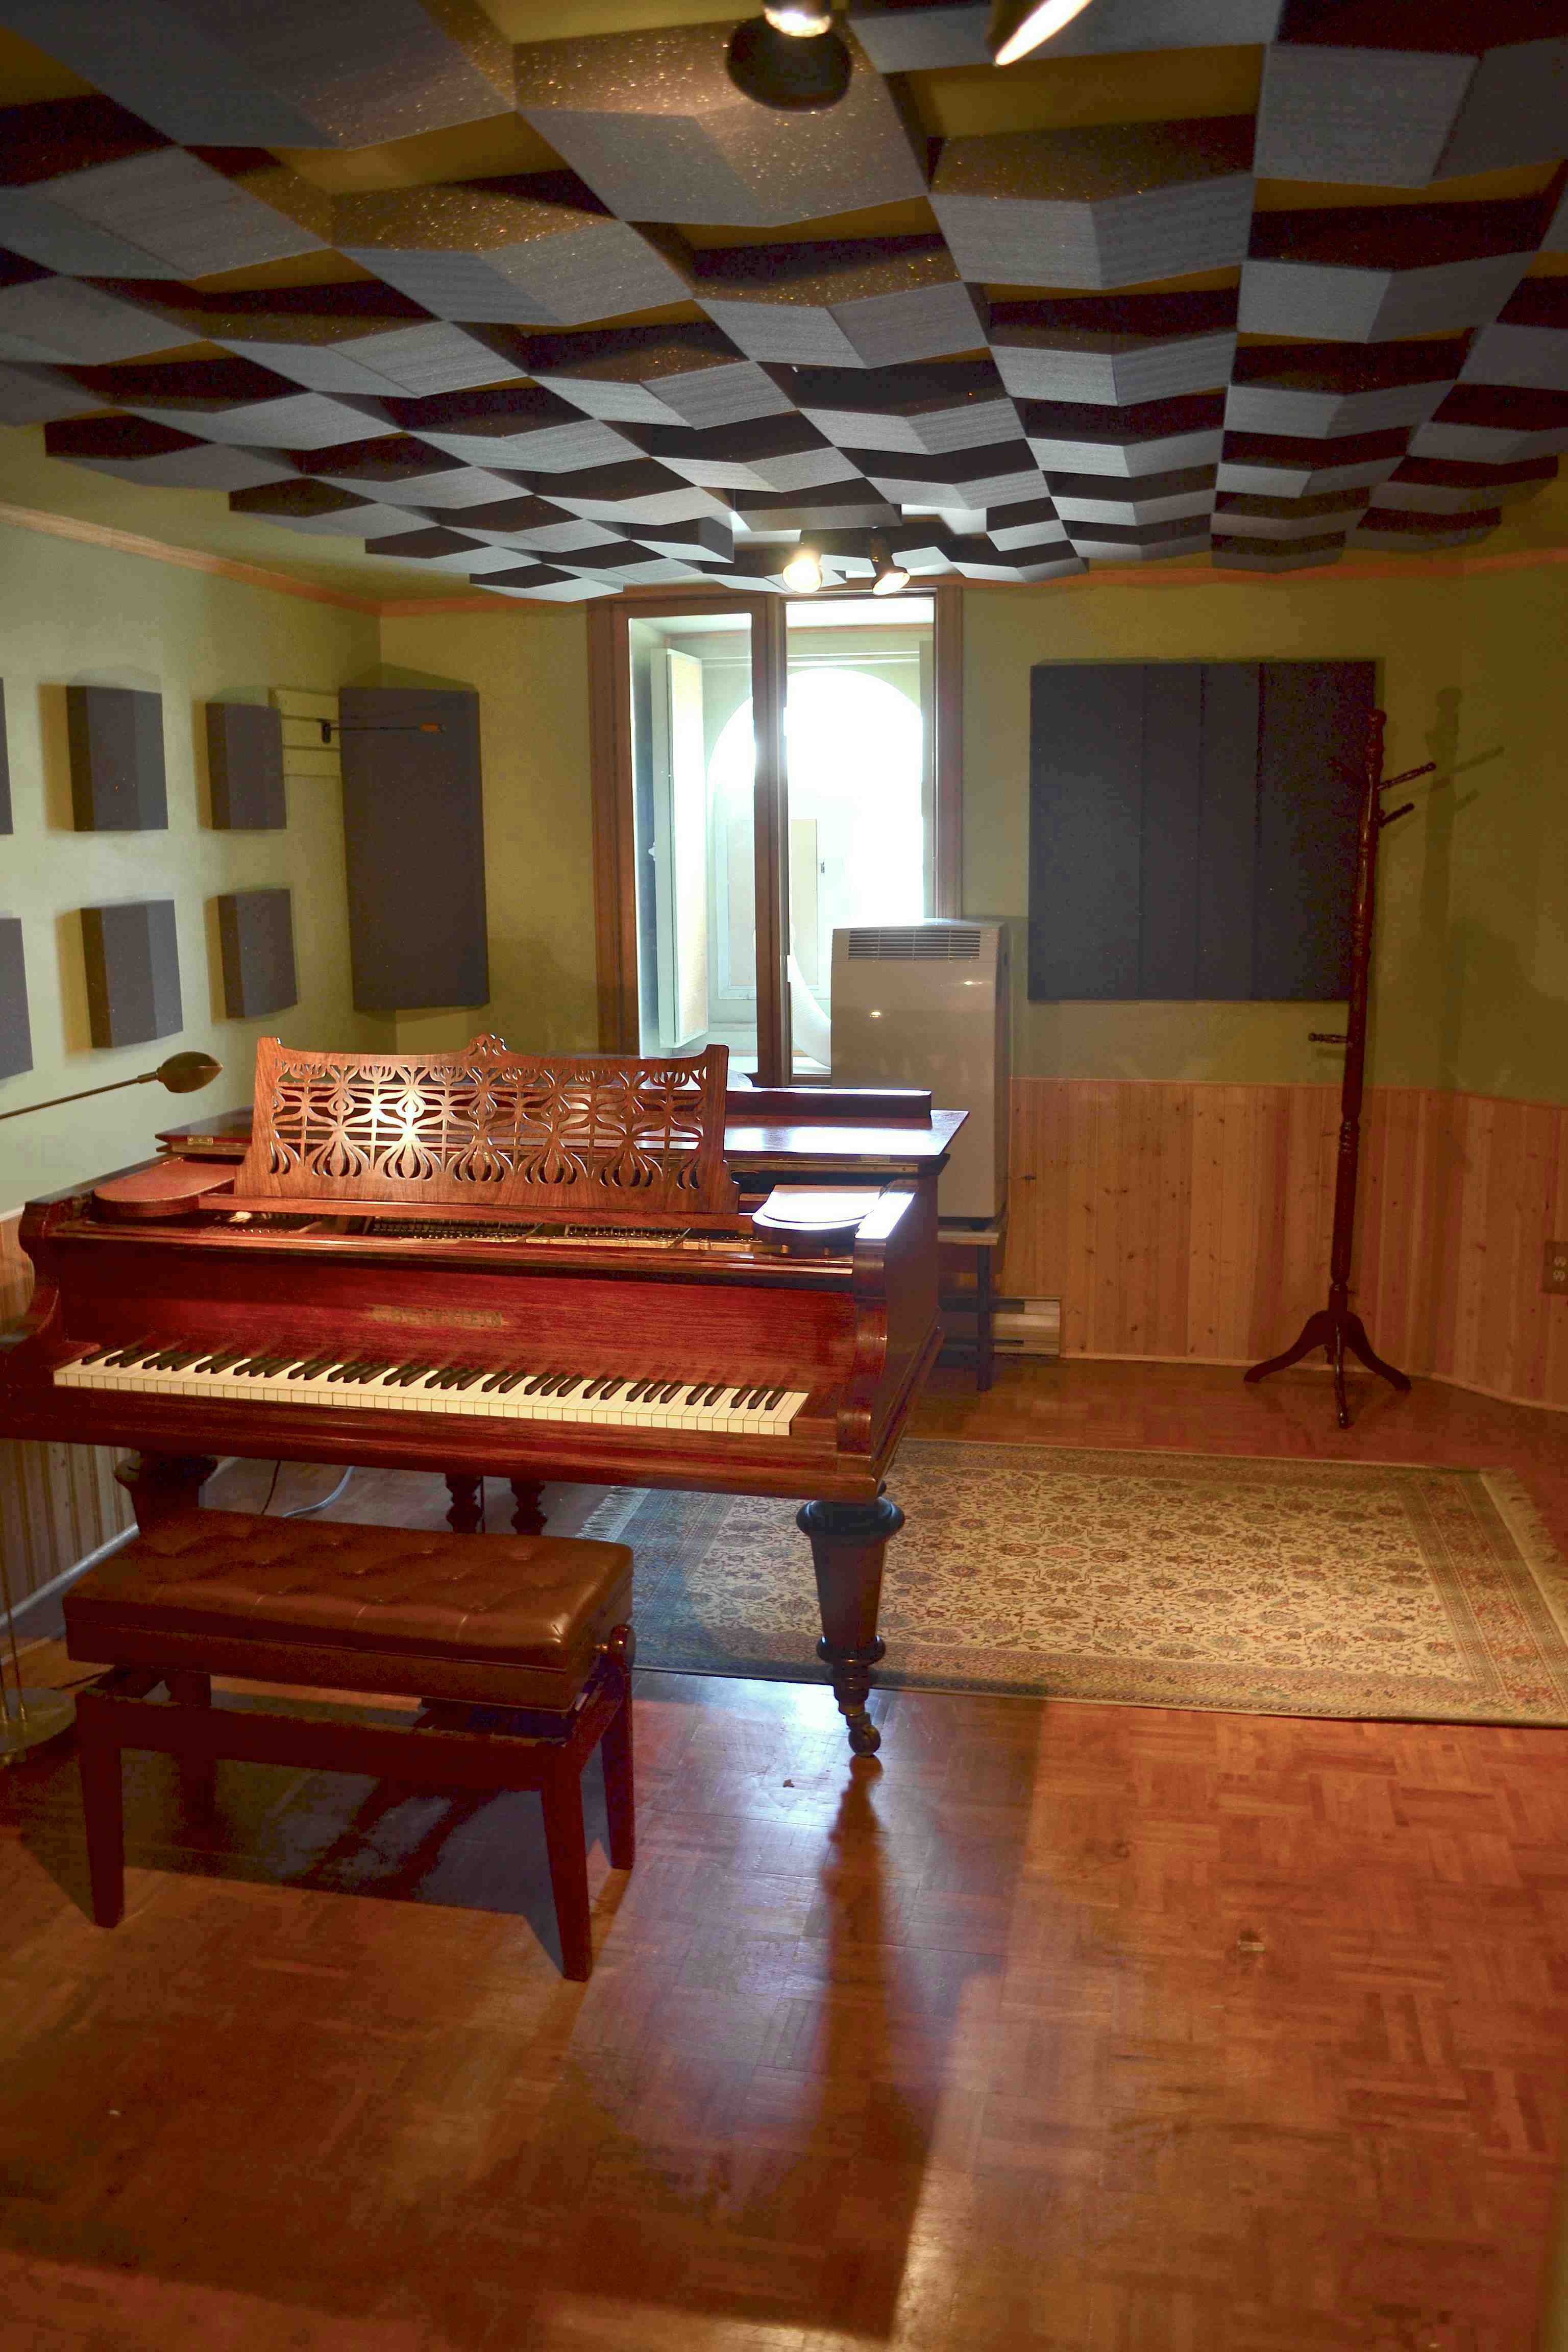 402 Rehearsal Studio With Bechstein Grand Piano